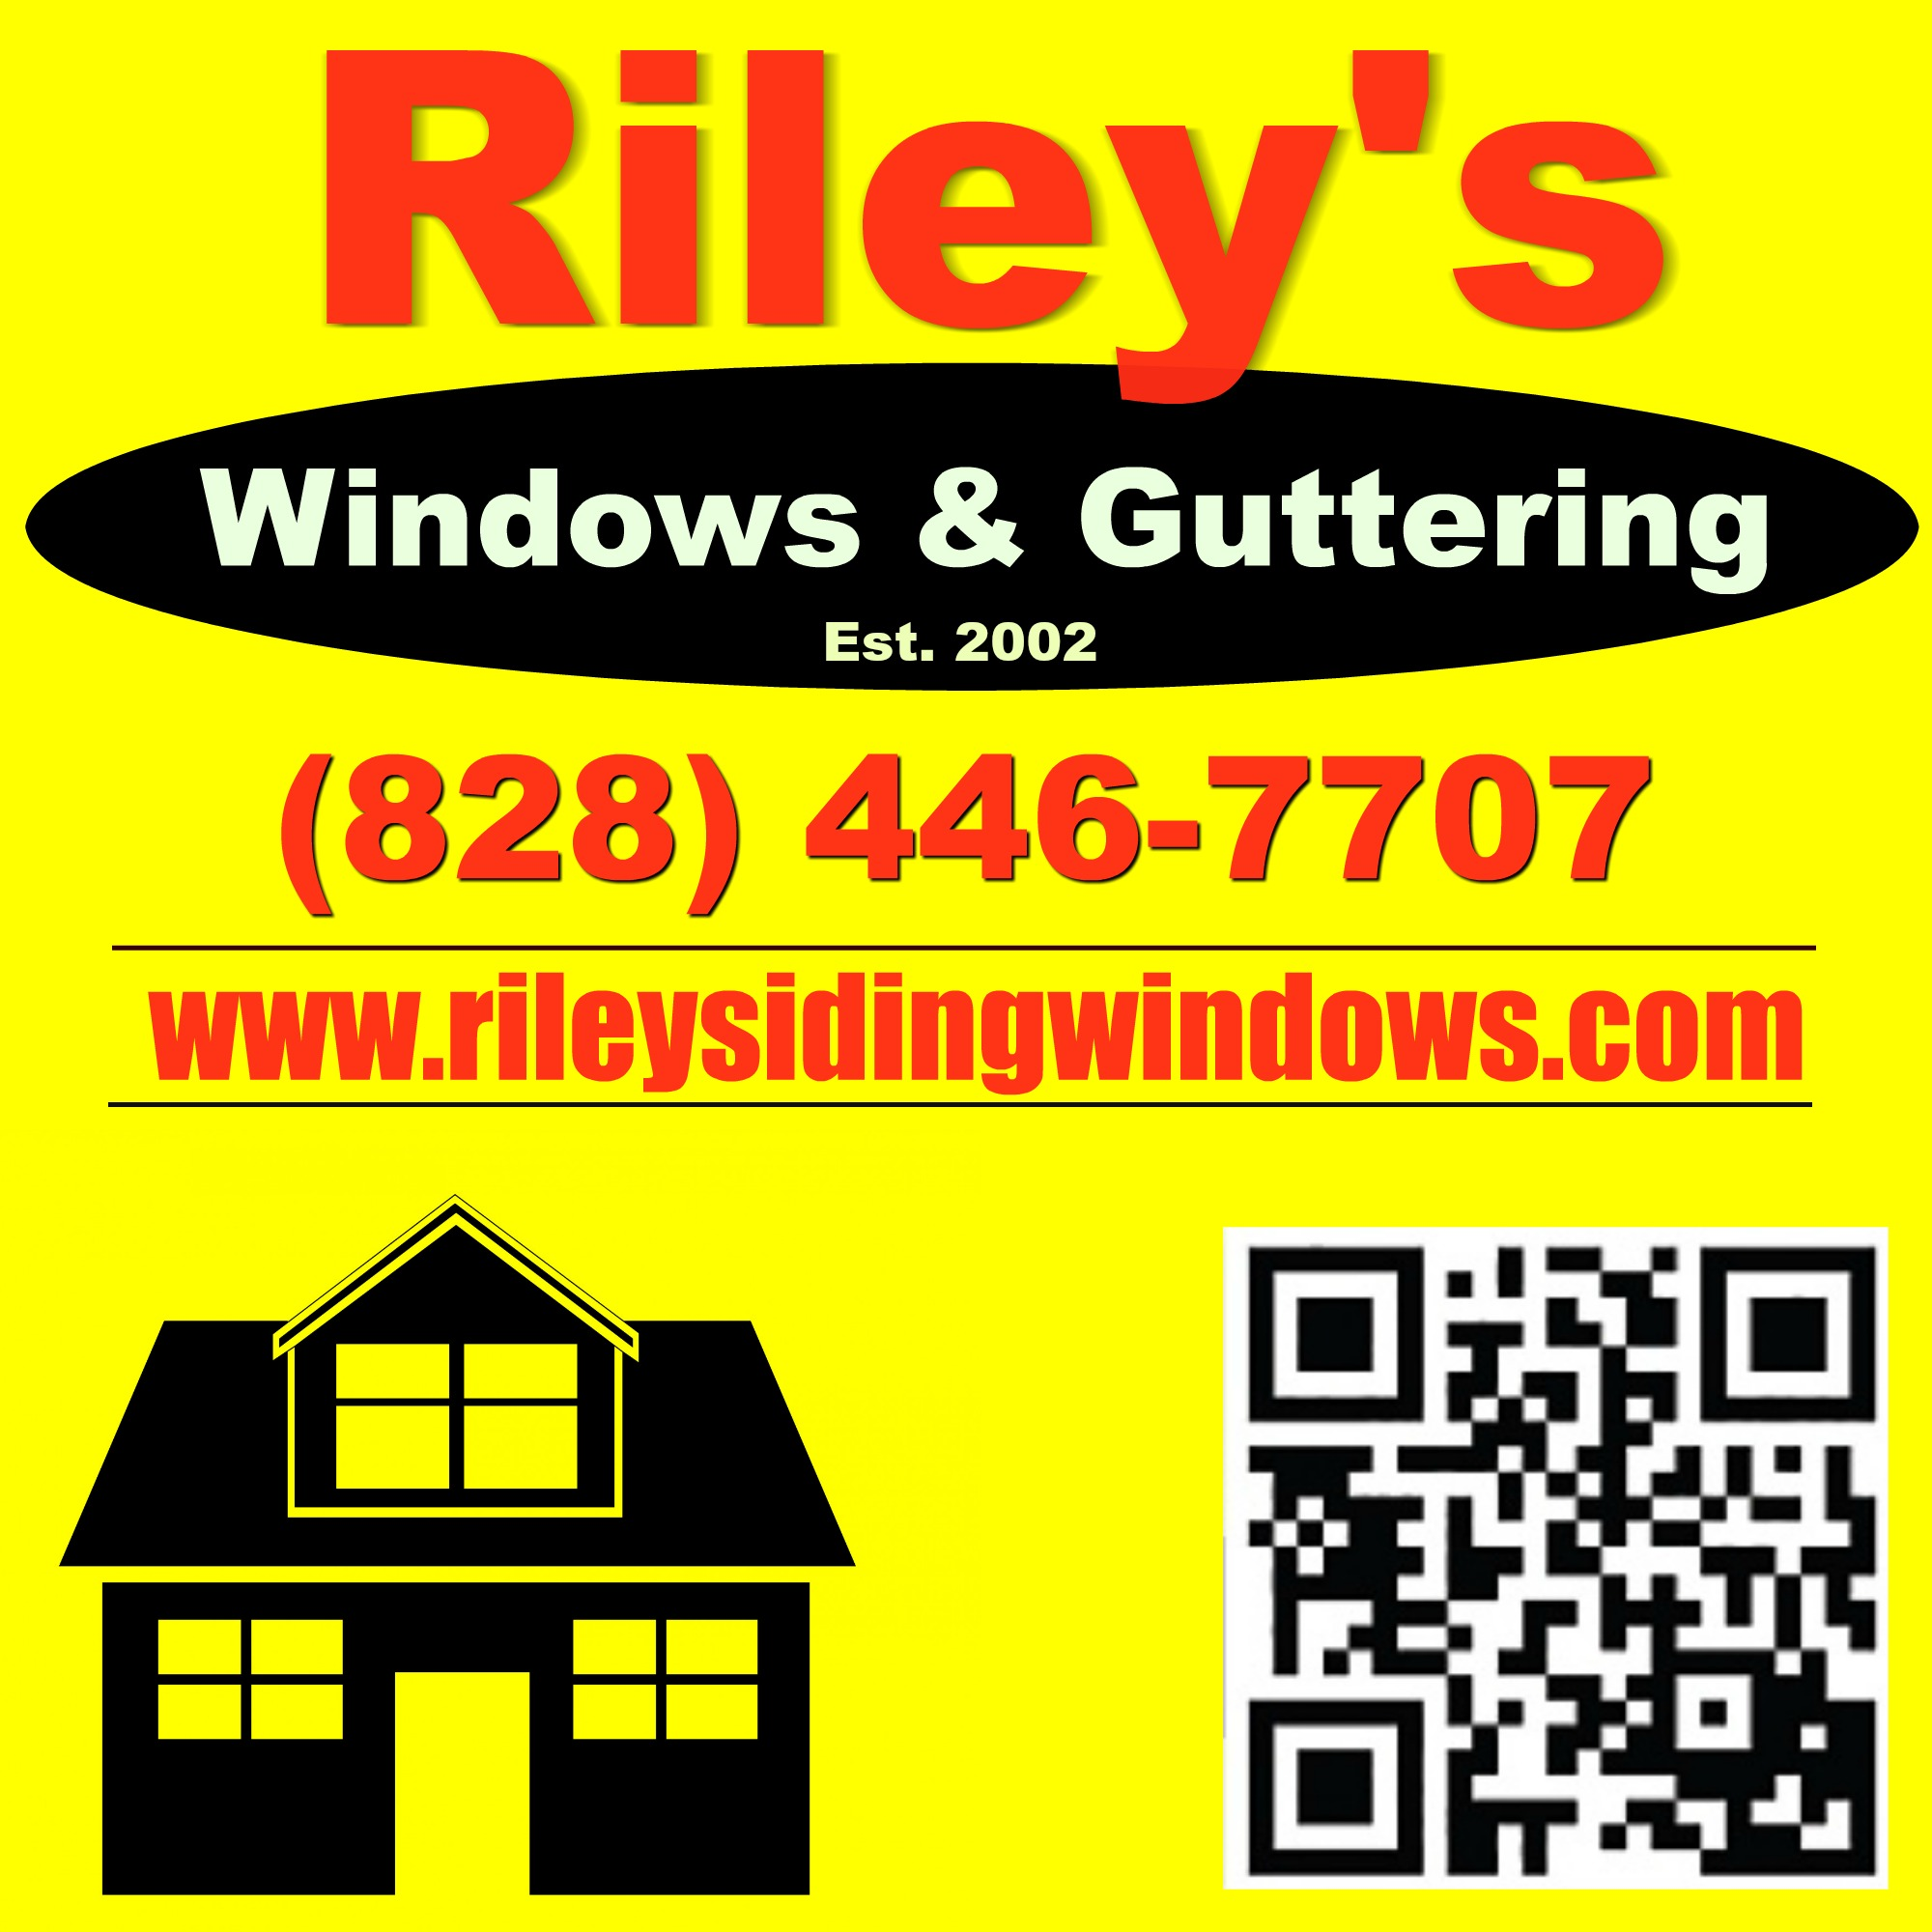 Riley's Siding & Windows